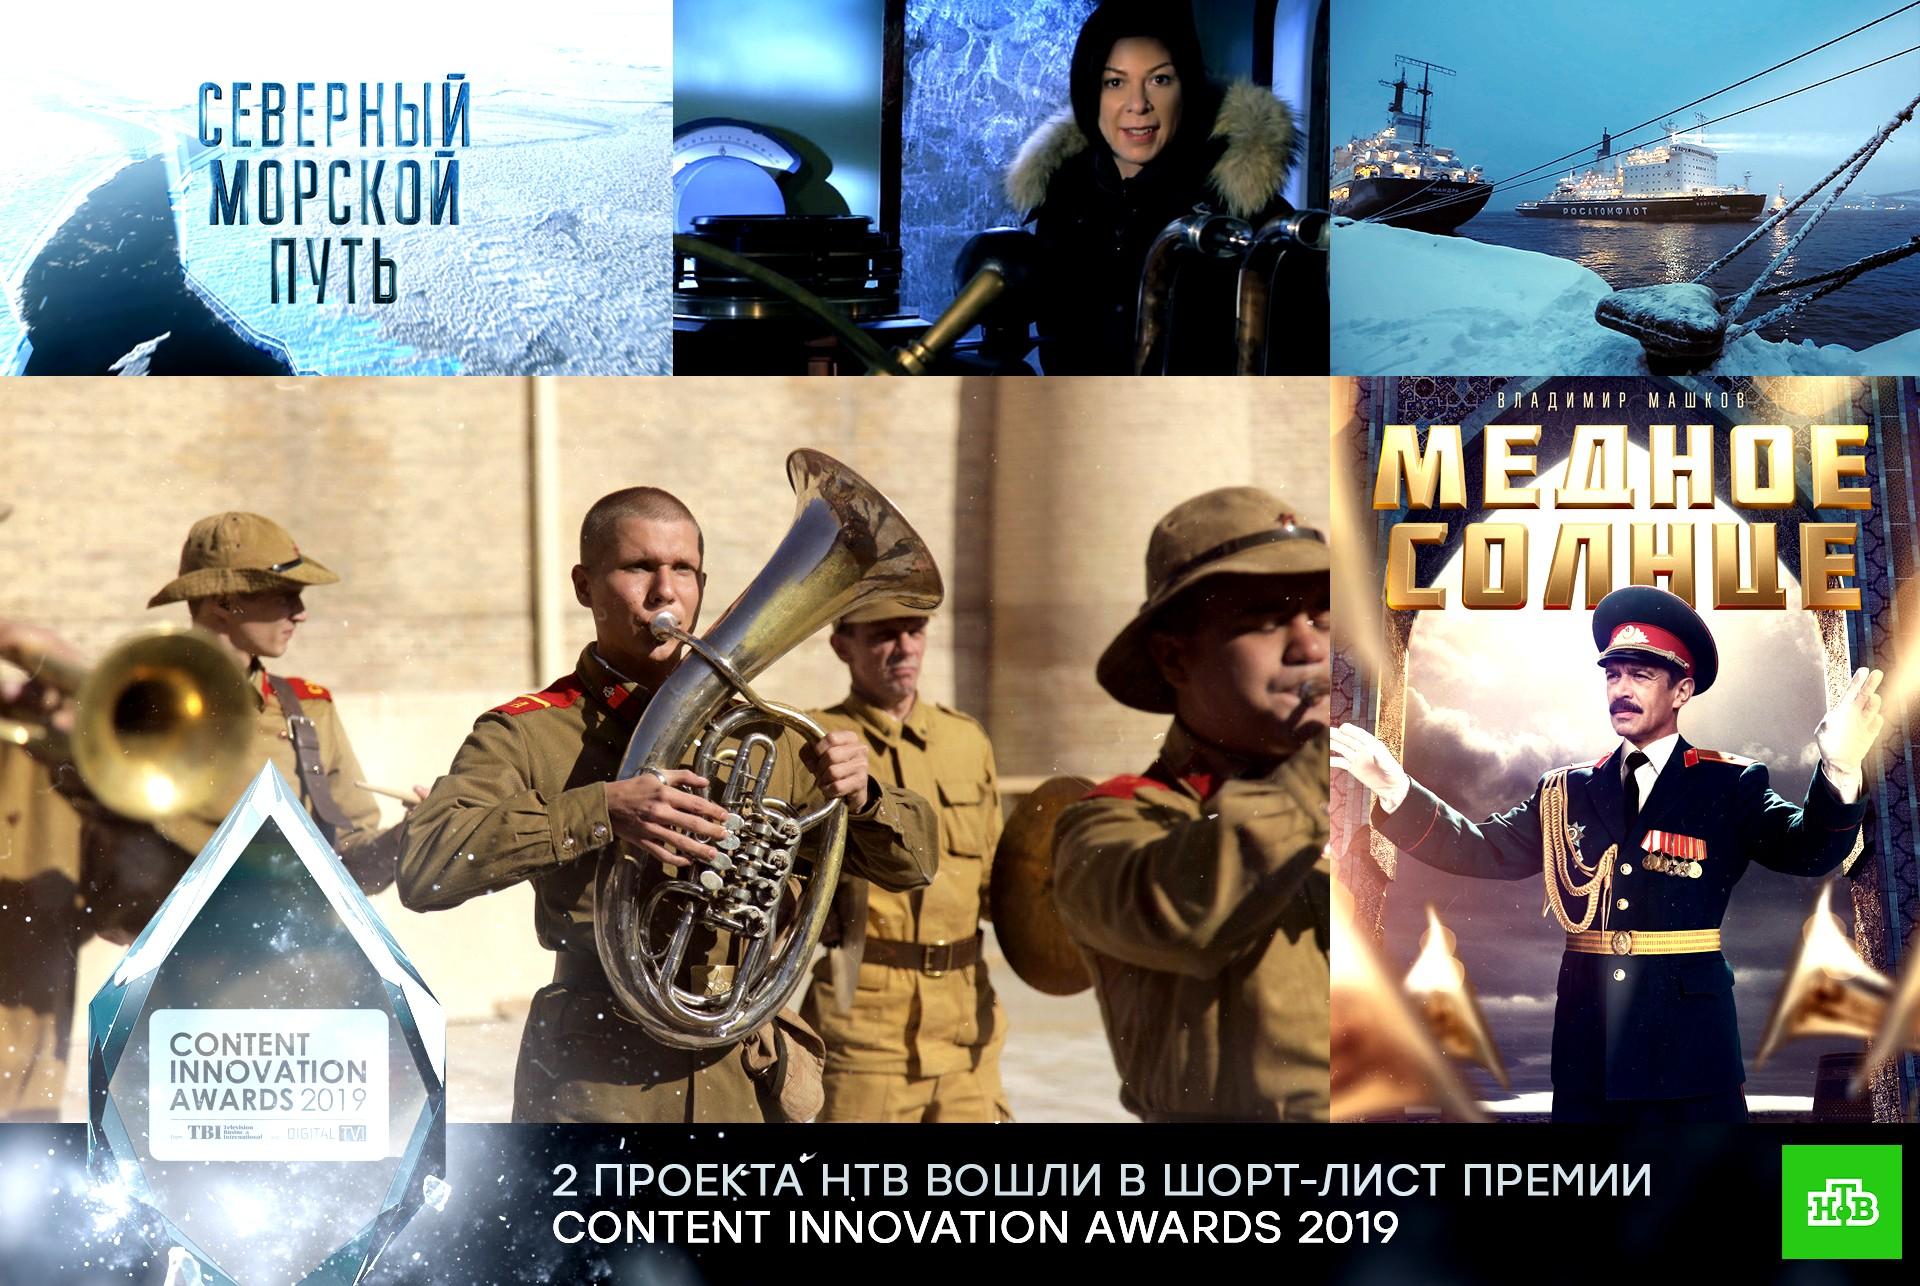 2 проекта НТВ стали номинантами Content InnovjьЁњш6с_